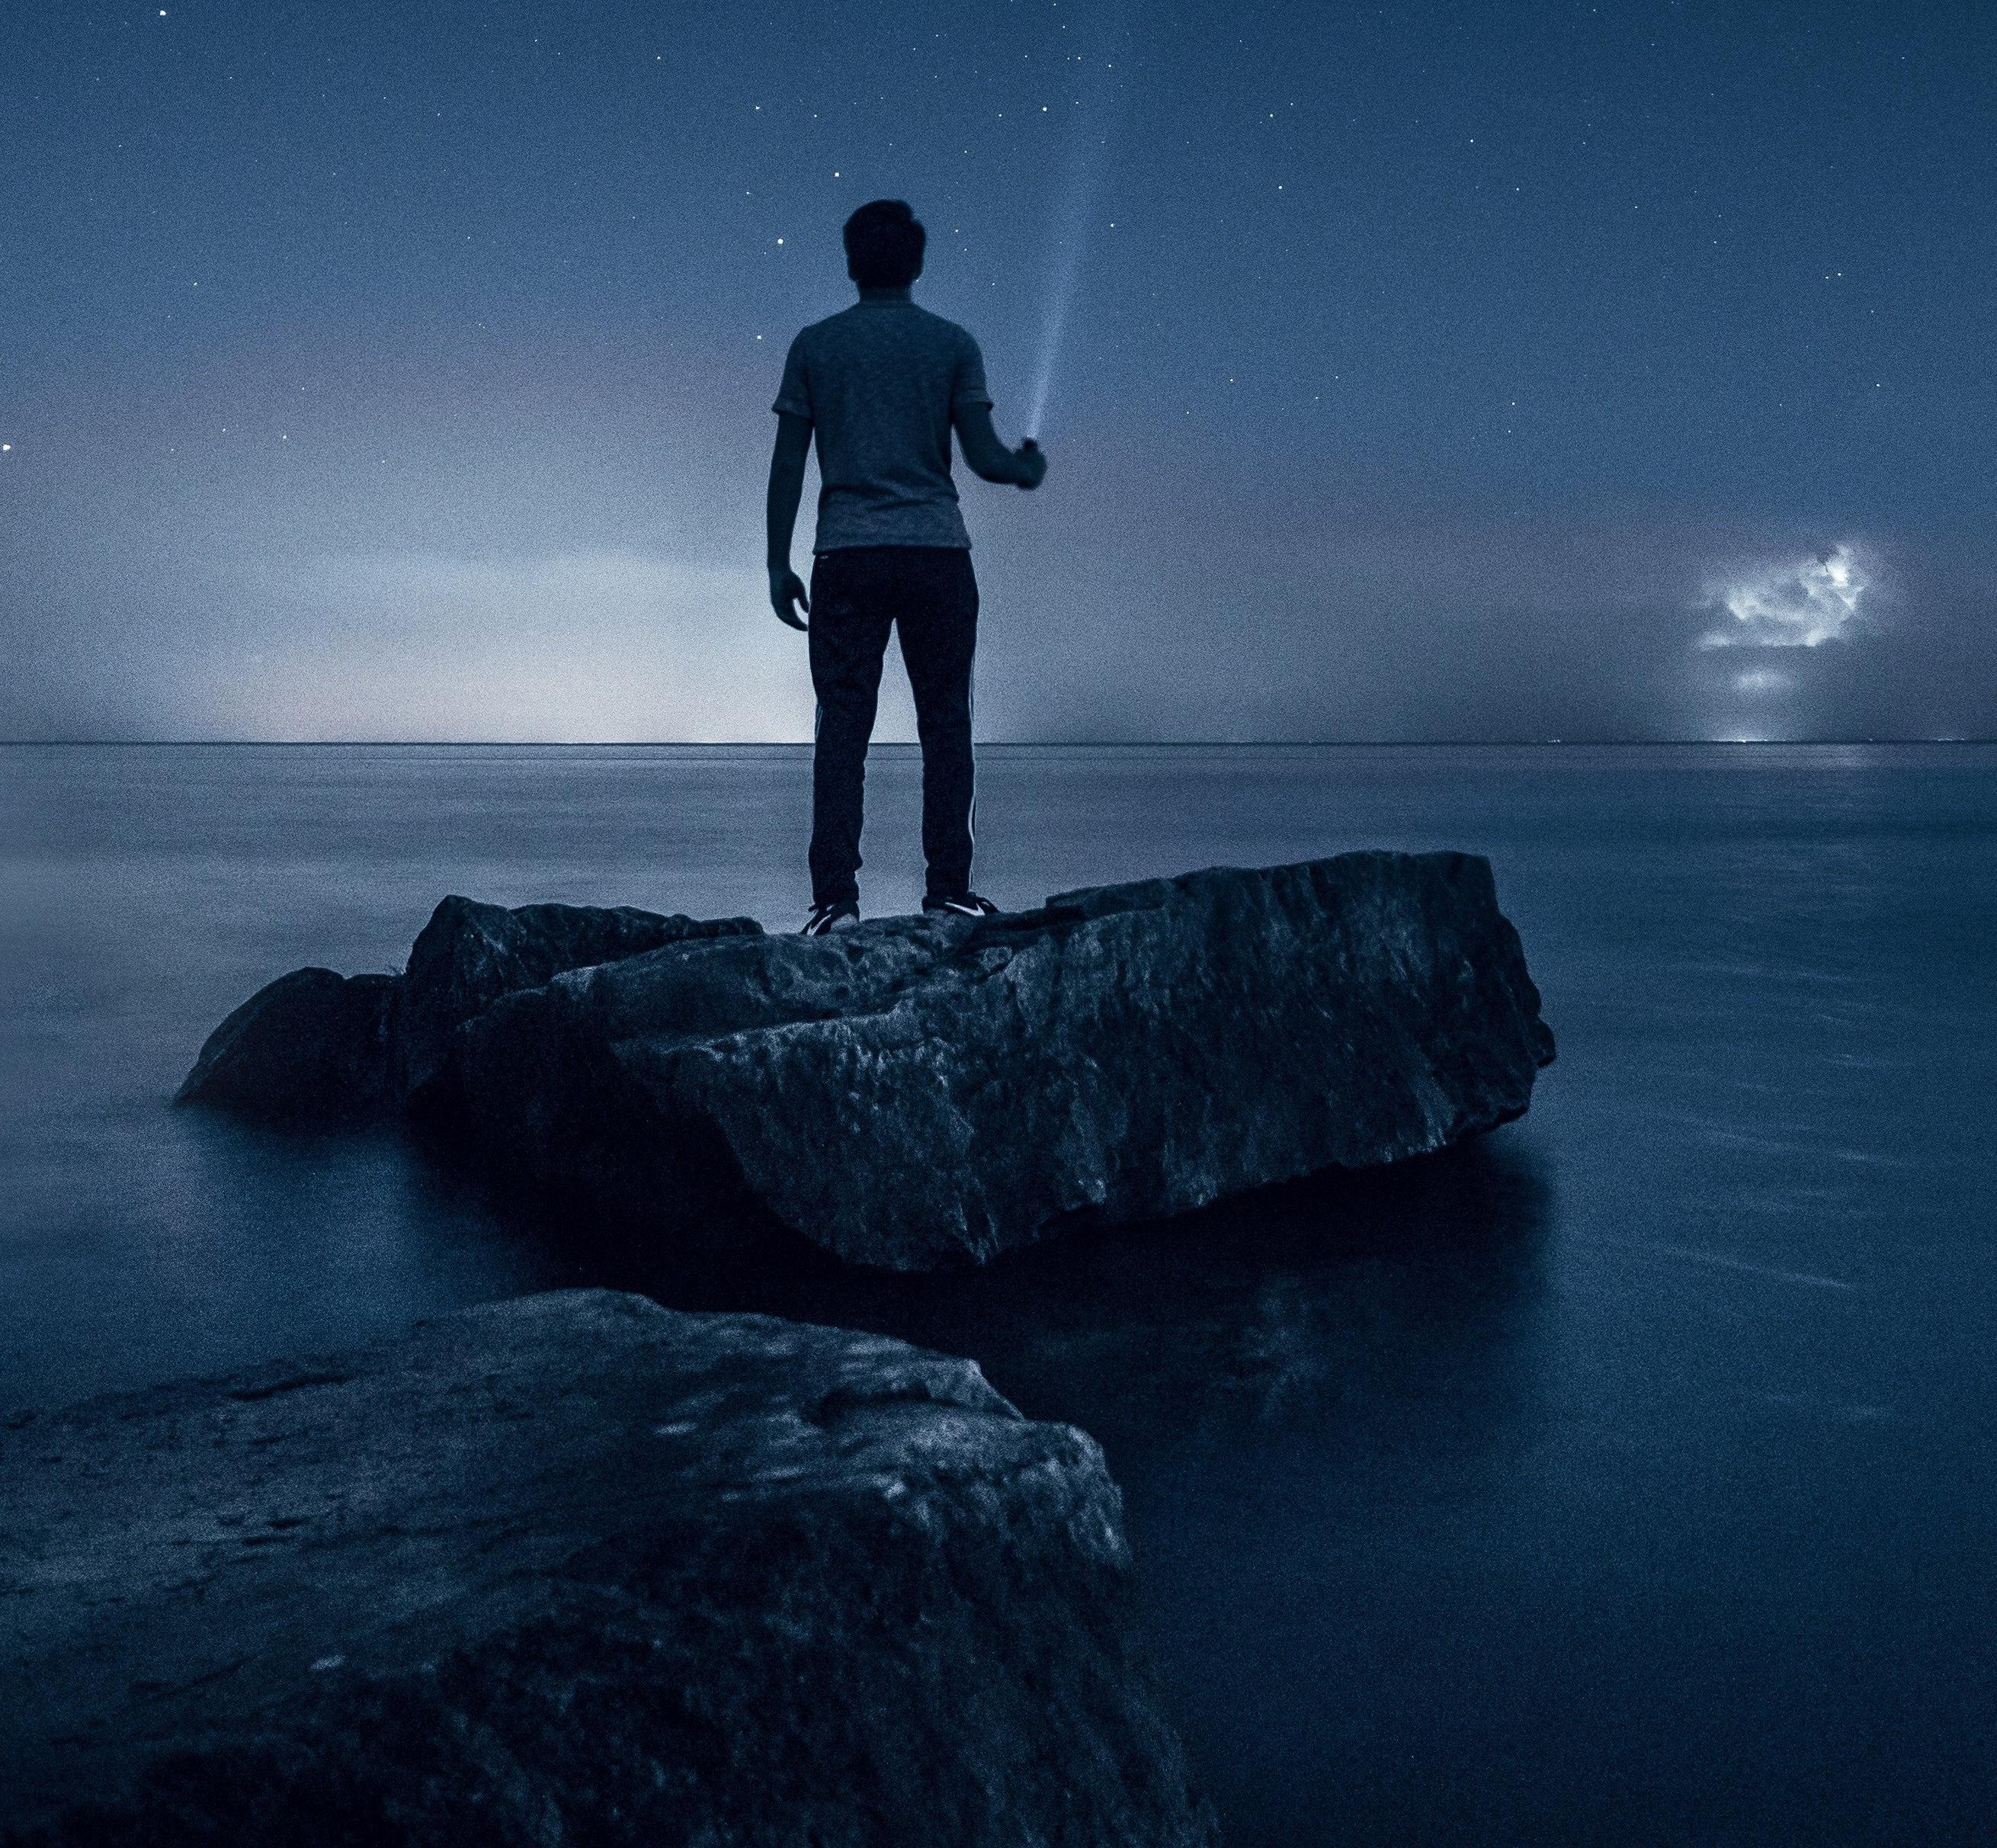 Trusting God When the Future seems Uncertain https://beckielindsey.com/2018/10/29/trusting-god-when-the-future-feels-uncertain/